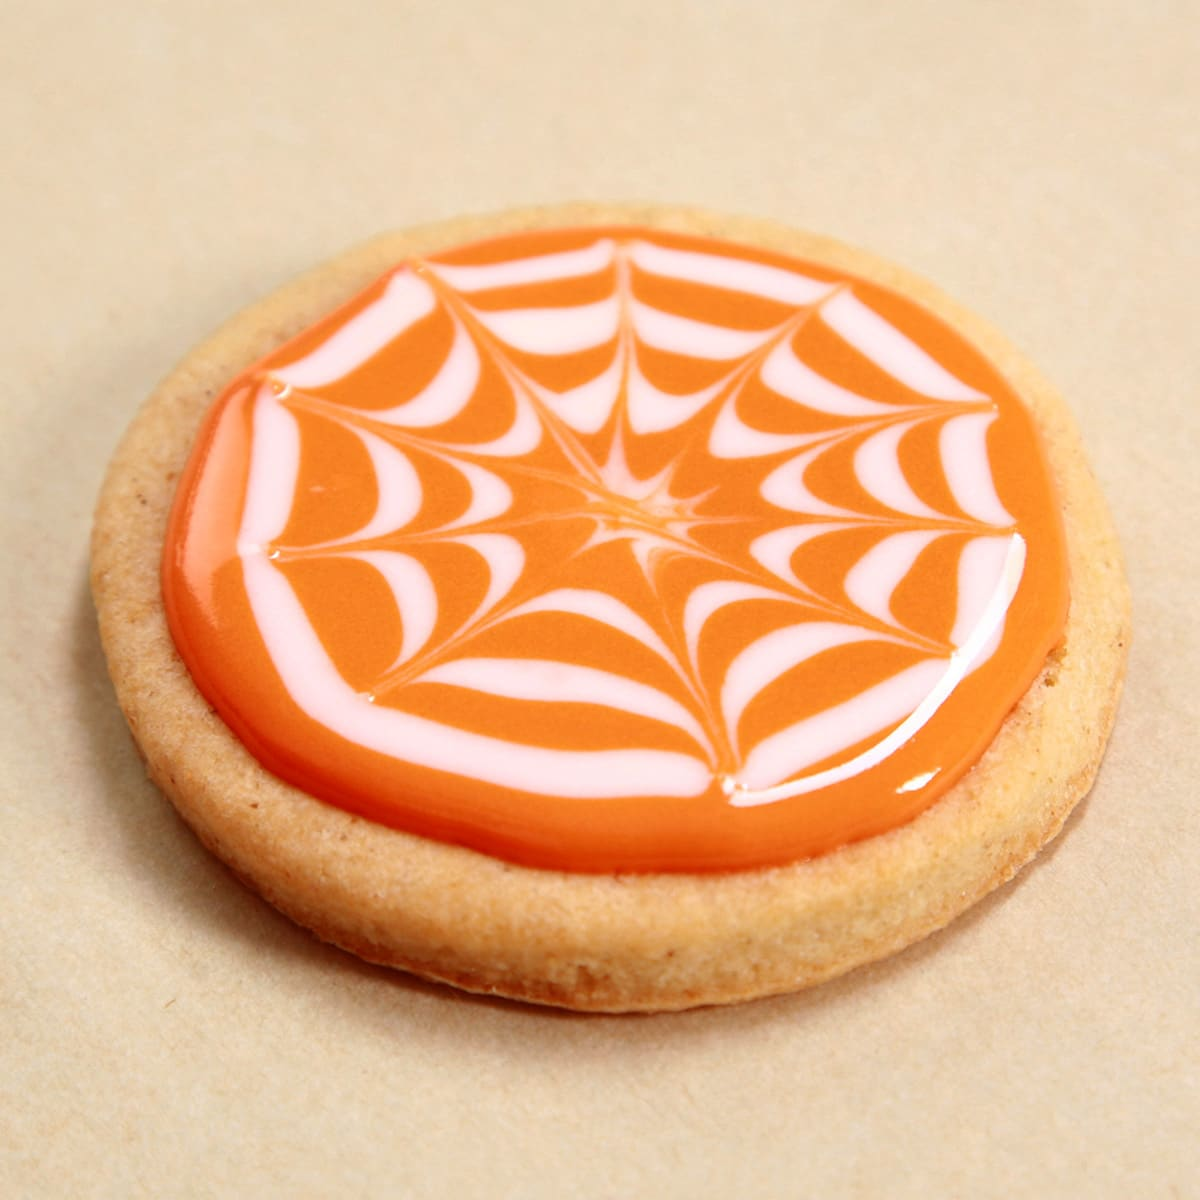 A round sugar cookie frosted orange, with a white spiderweb design.